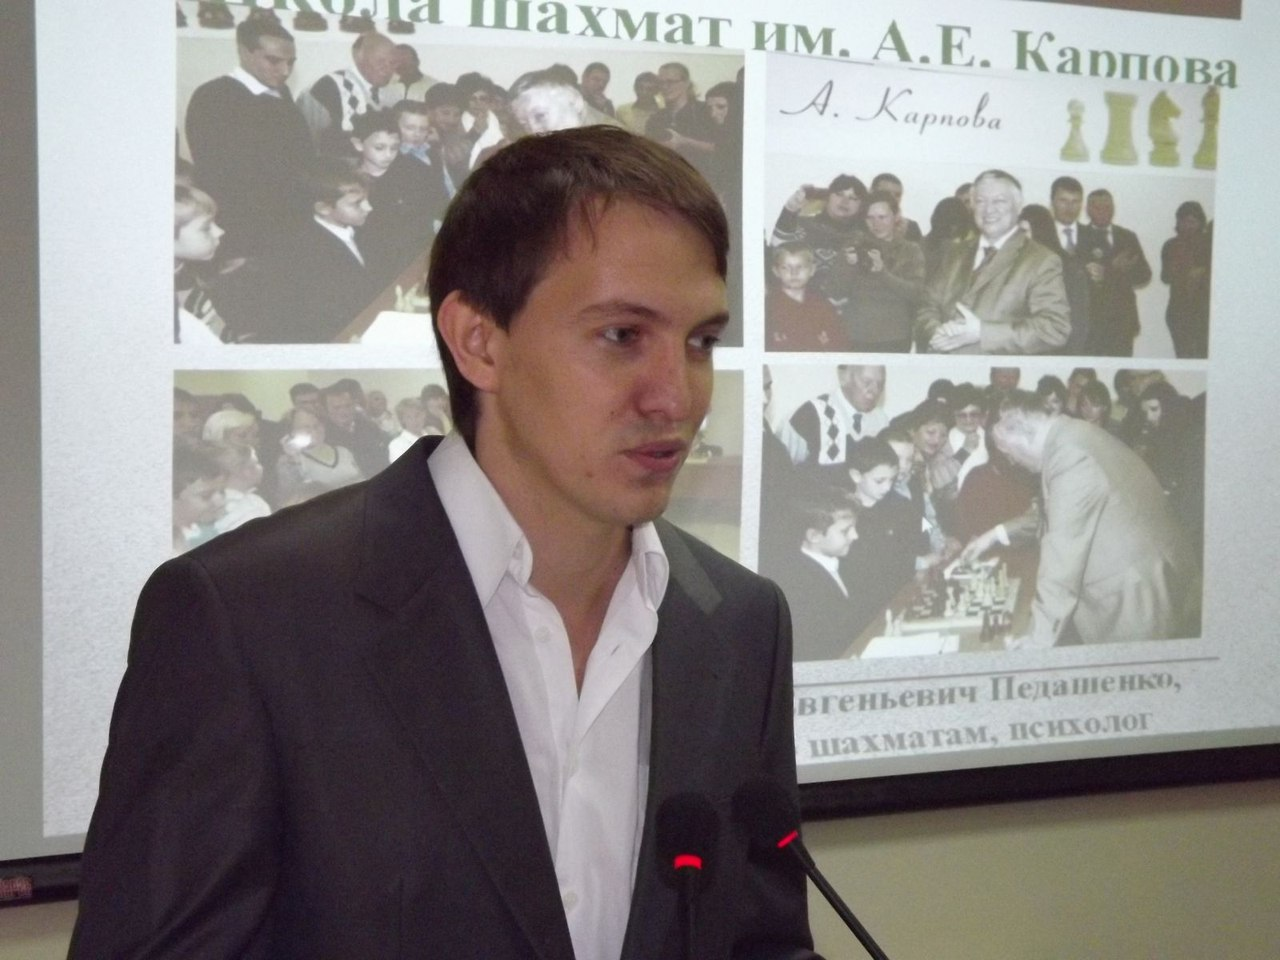 Педашенко Анатолий